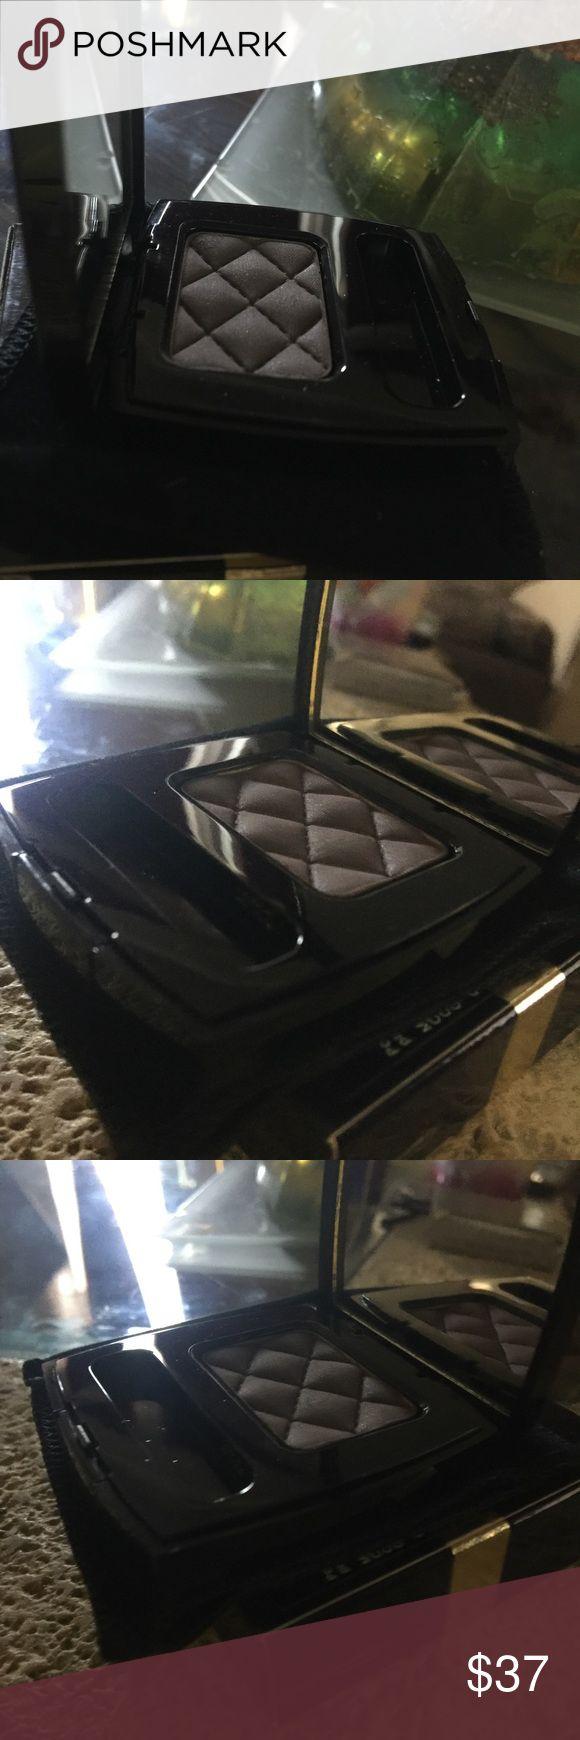 Brand New Vintage Chanel Eyeshadow Brand New Vintage Chanel Eyeshadow Ombre  Couture Collection Jersey Jersey